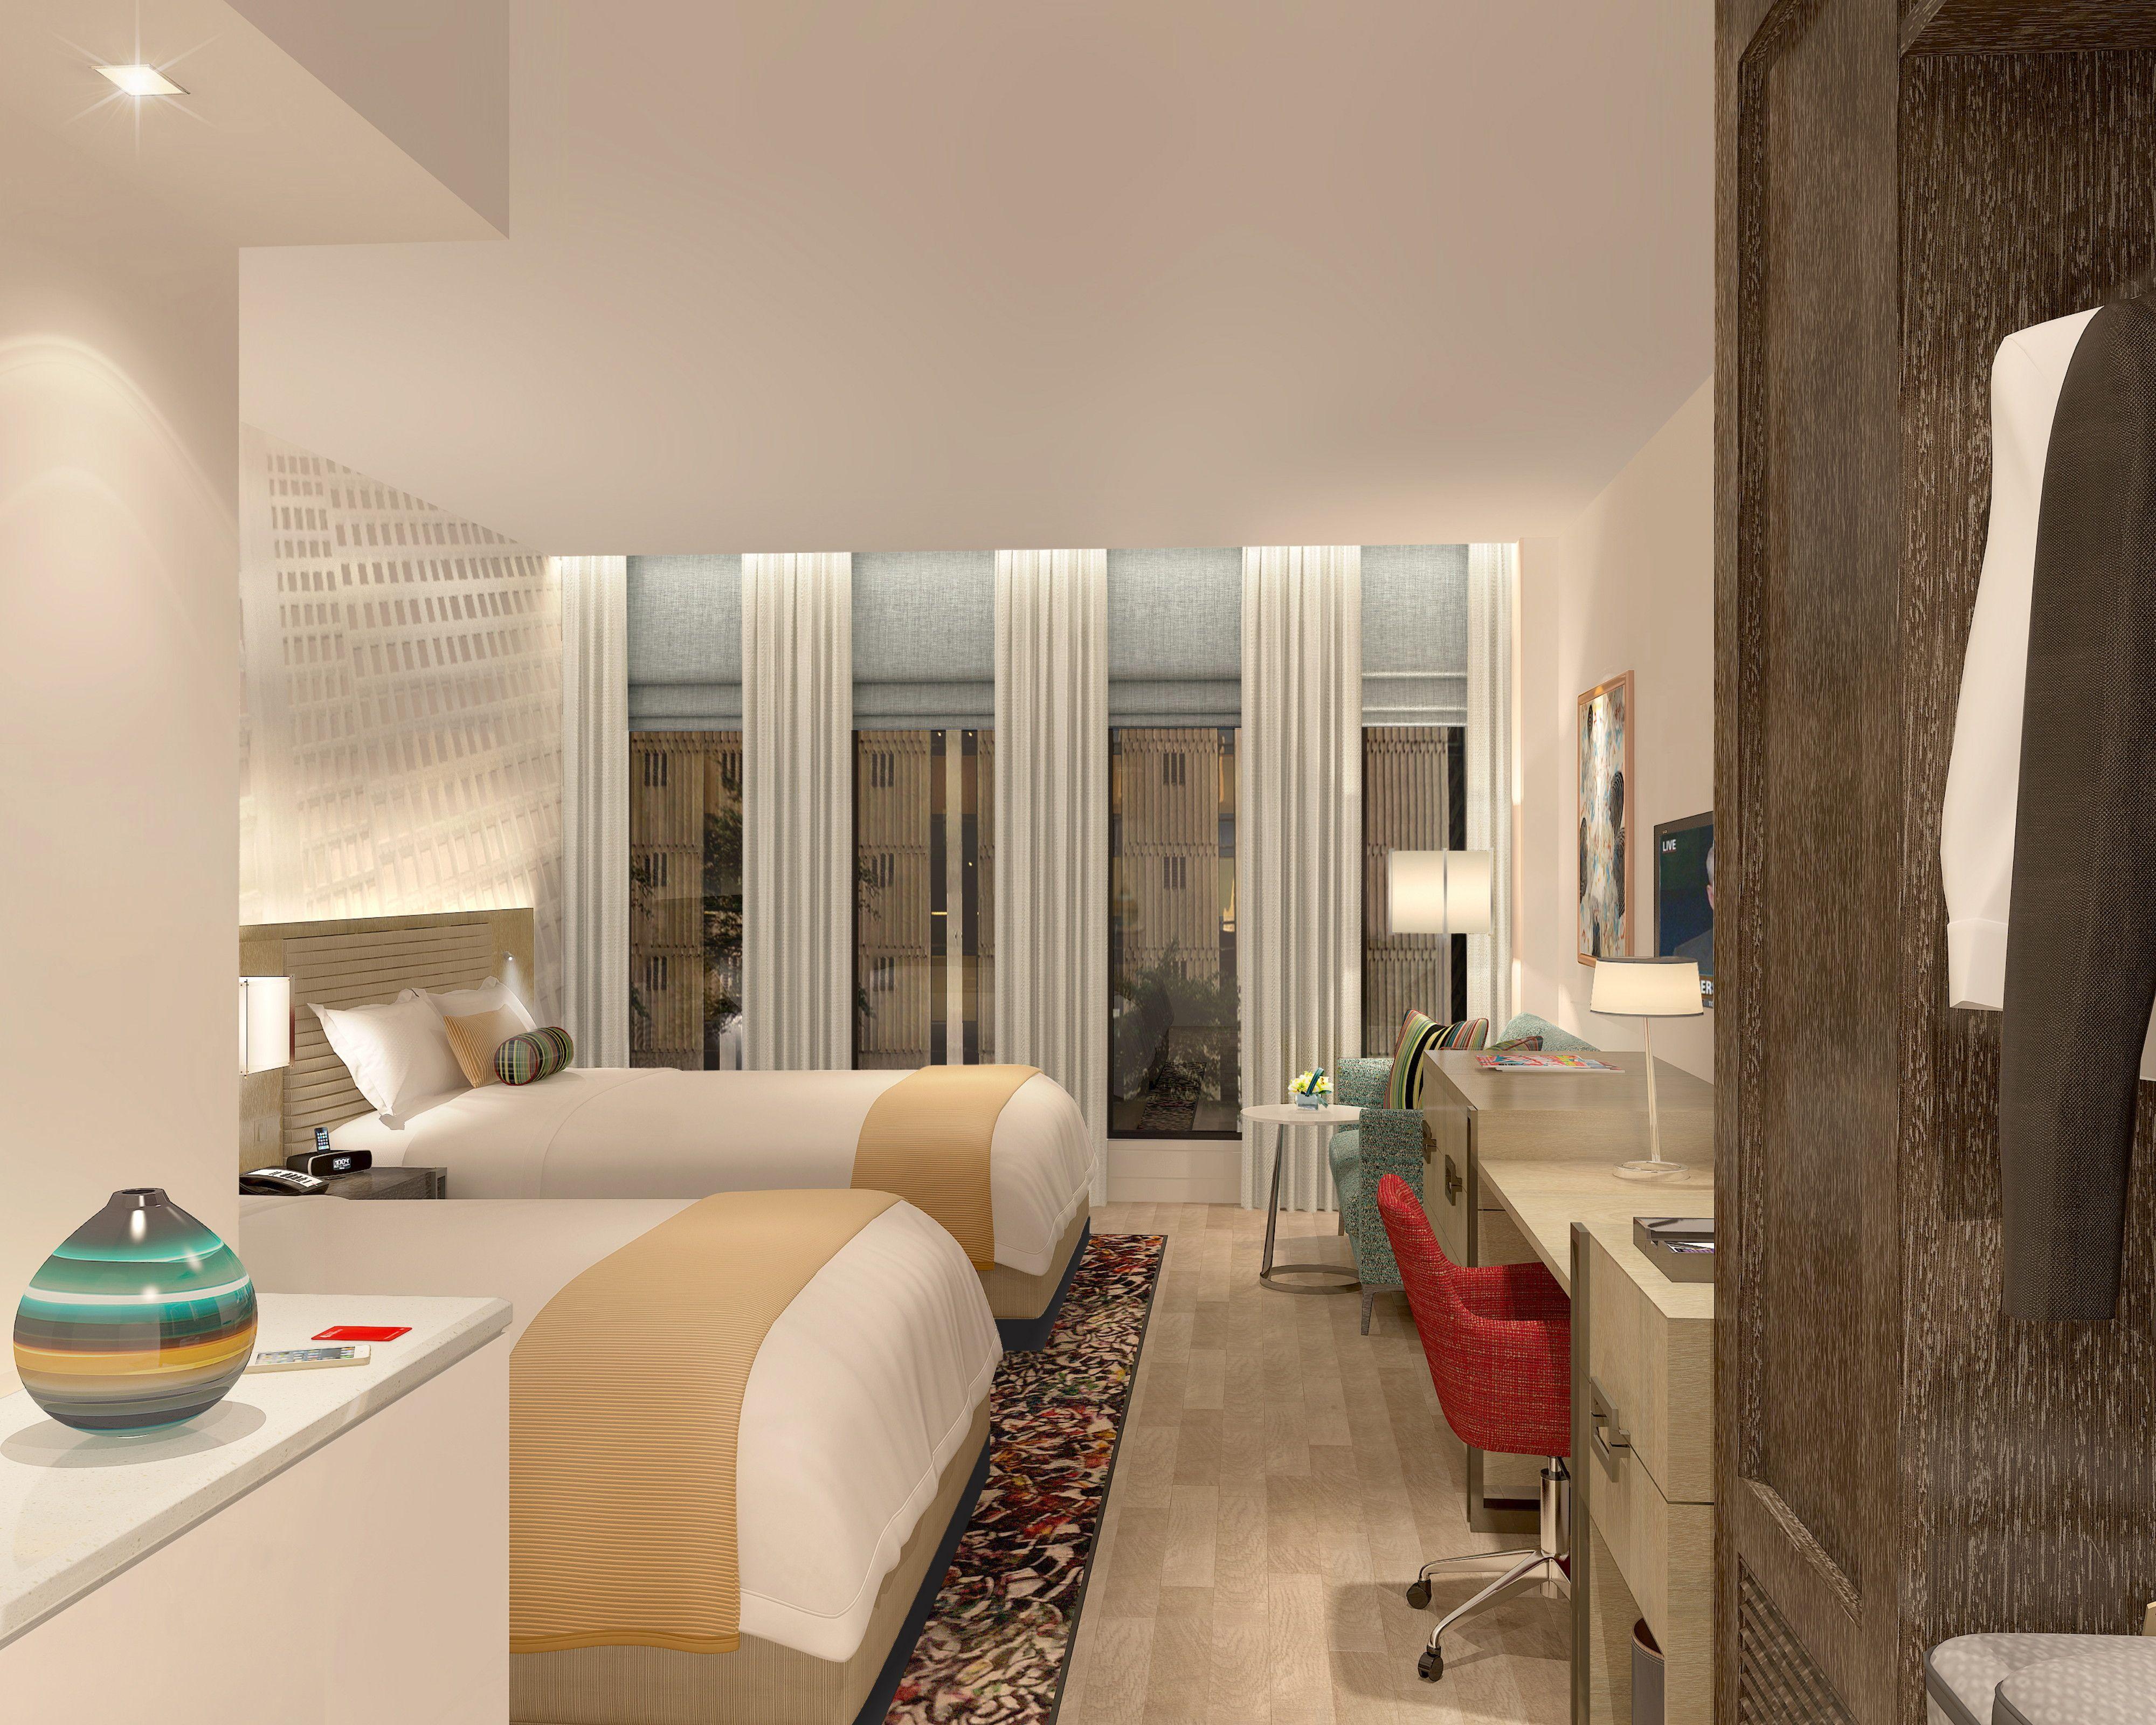 Modern Bedrooms Make A Future Reservation At Http Www Ihg Com Hotelindigo Hotels Us En Atlanta Atlid Hoteldetail Hotel Atlanta Hotels Modern Bedroom